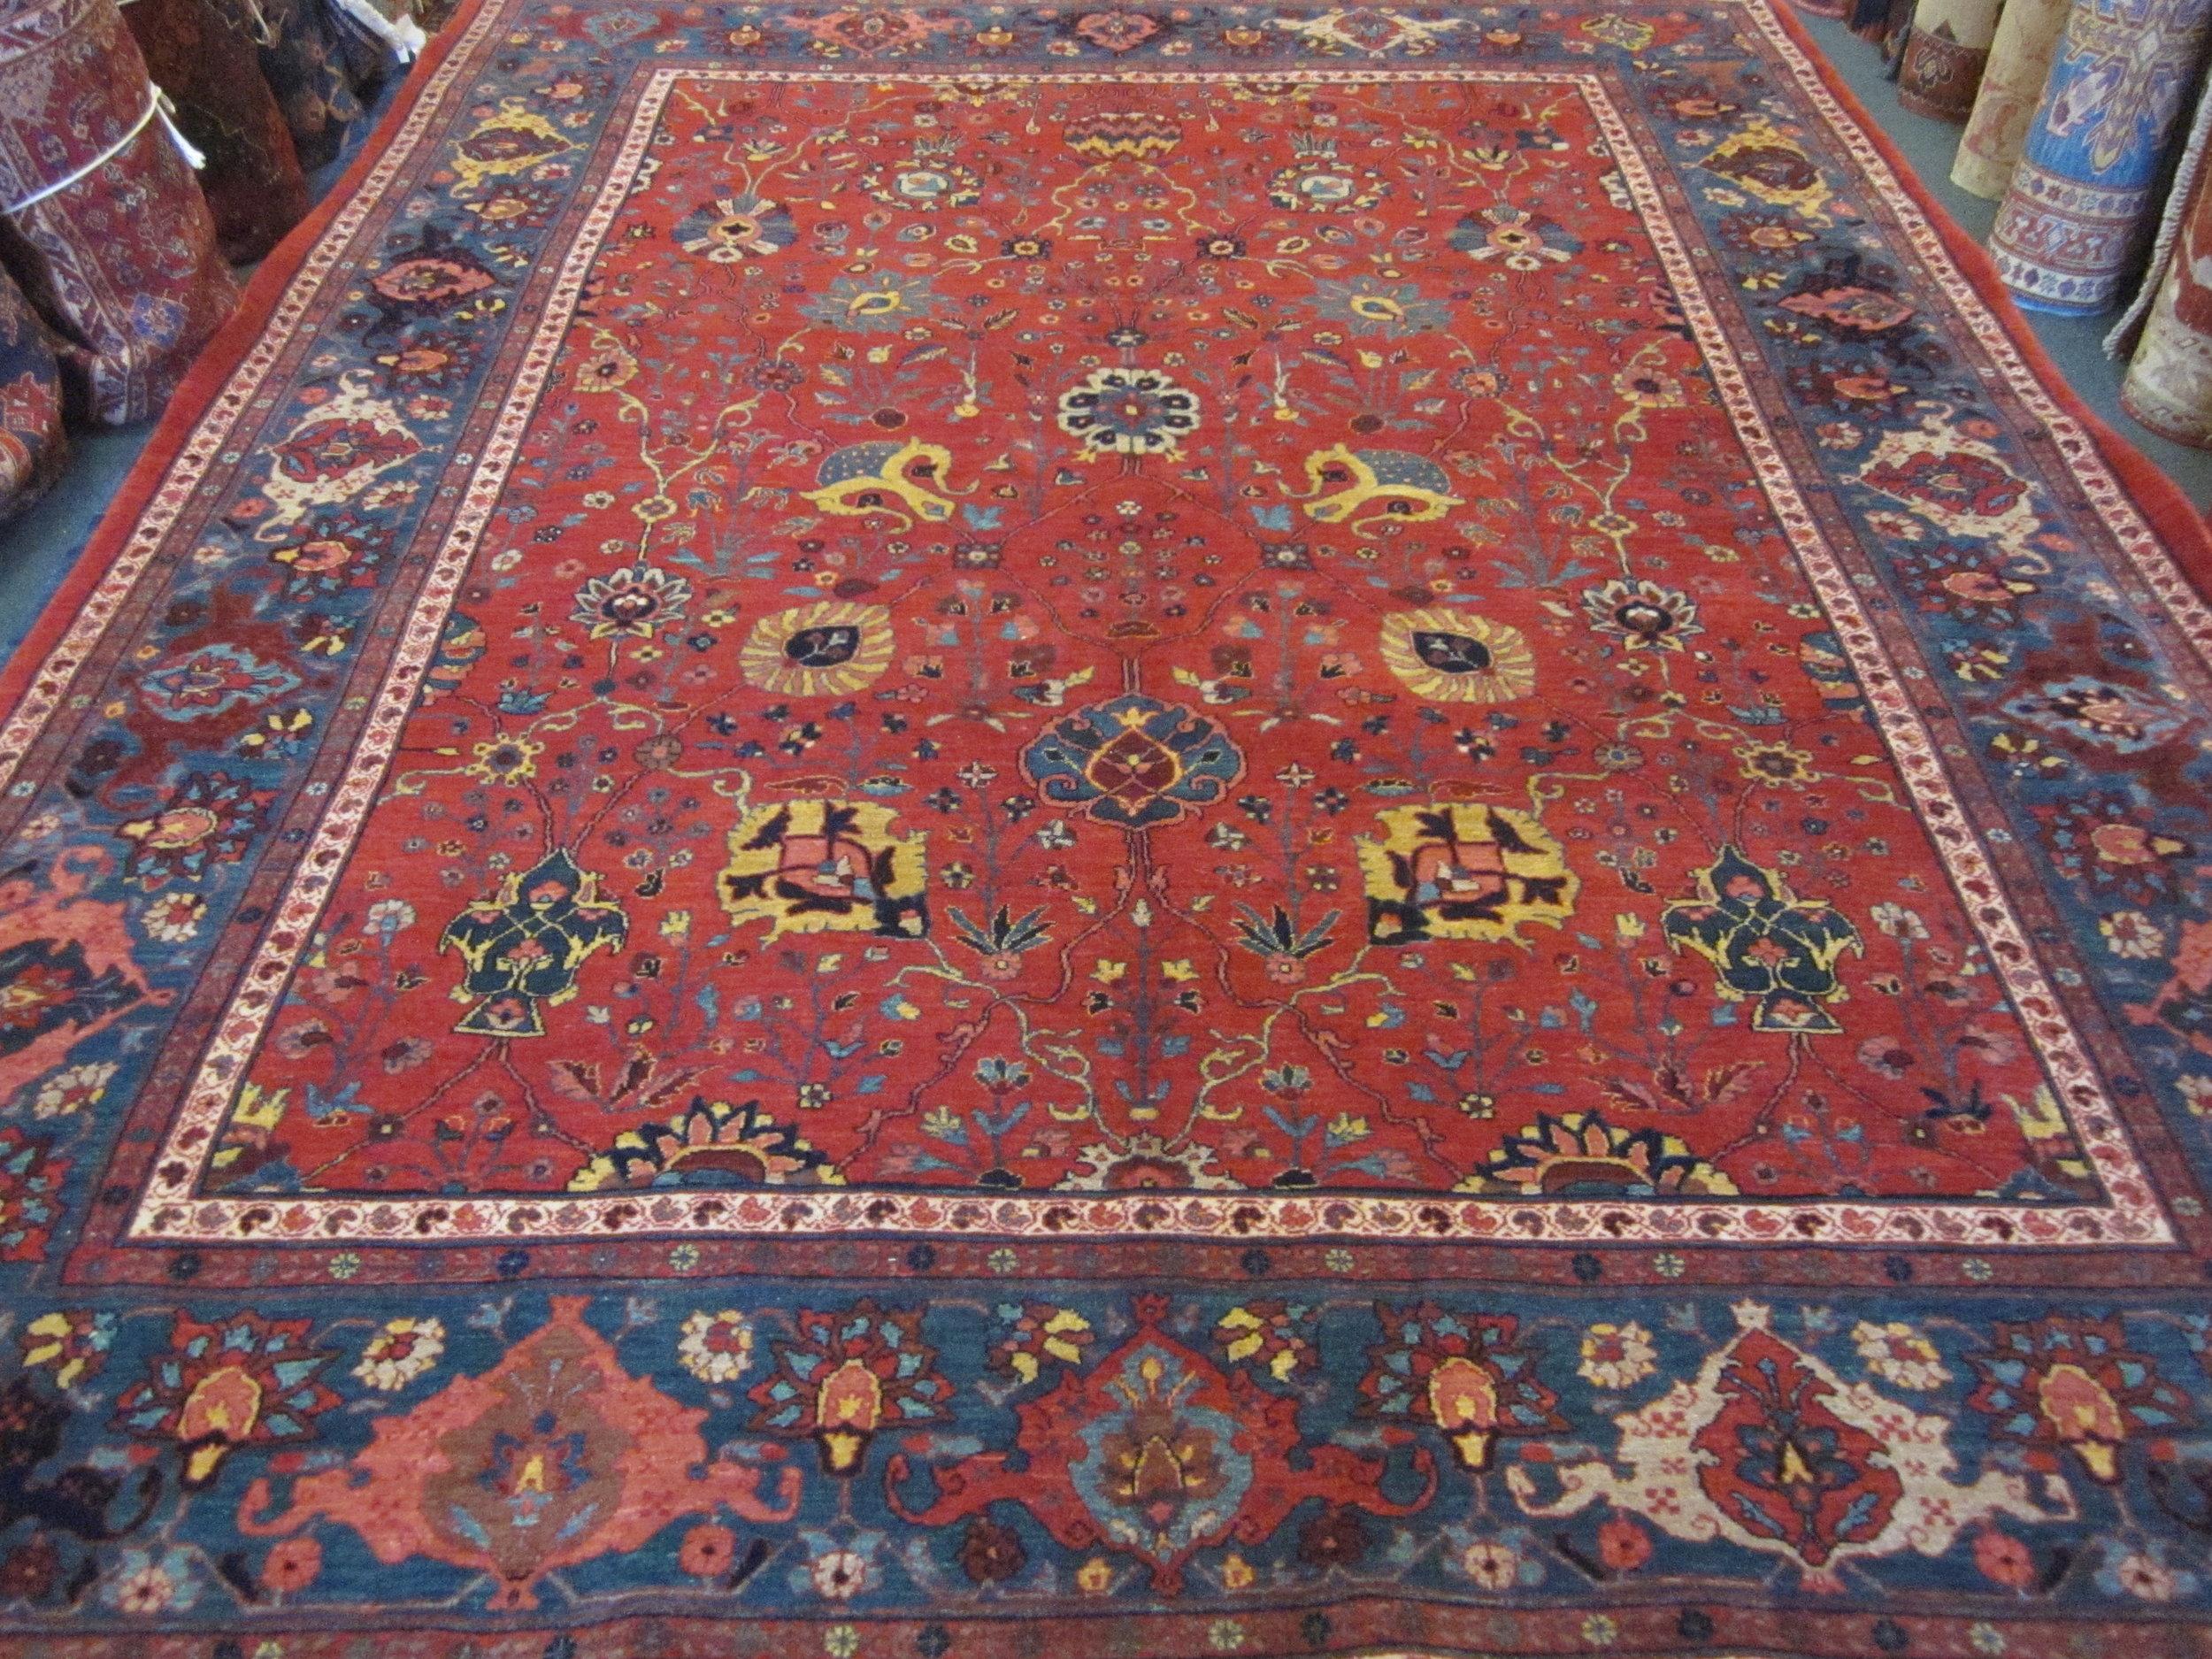 #36a) Gorgeous 8 x 11 Persian Bijar Carpet. Antique Shah Abbas design. New rug!